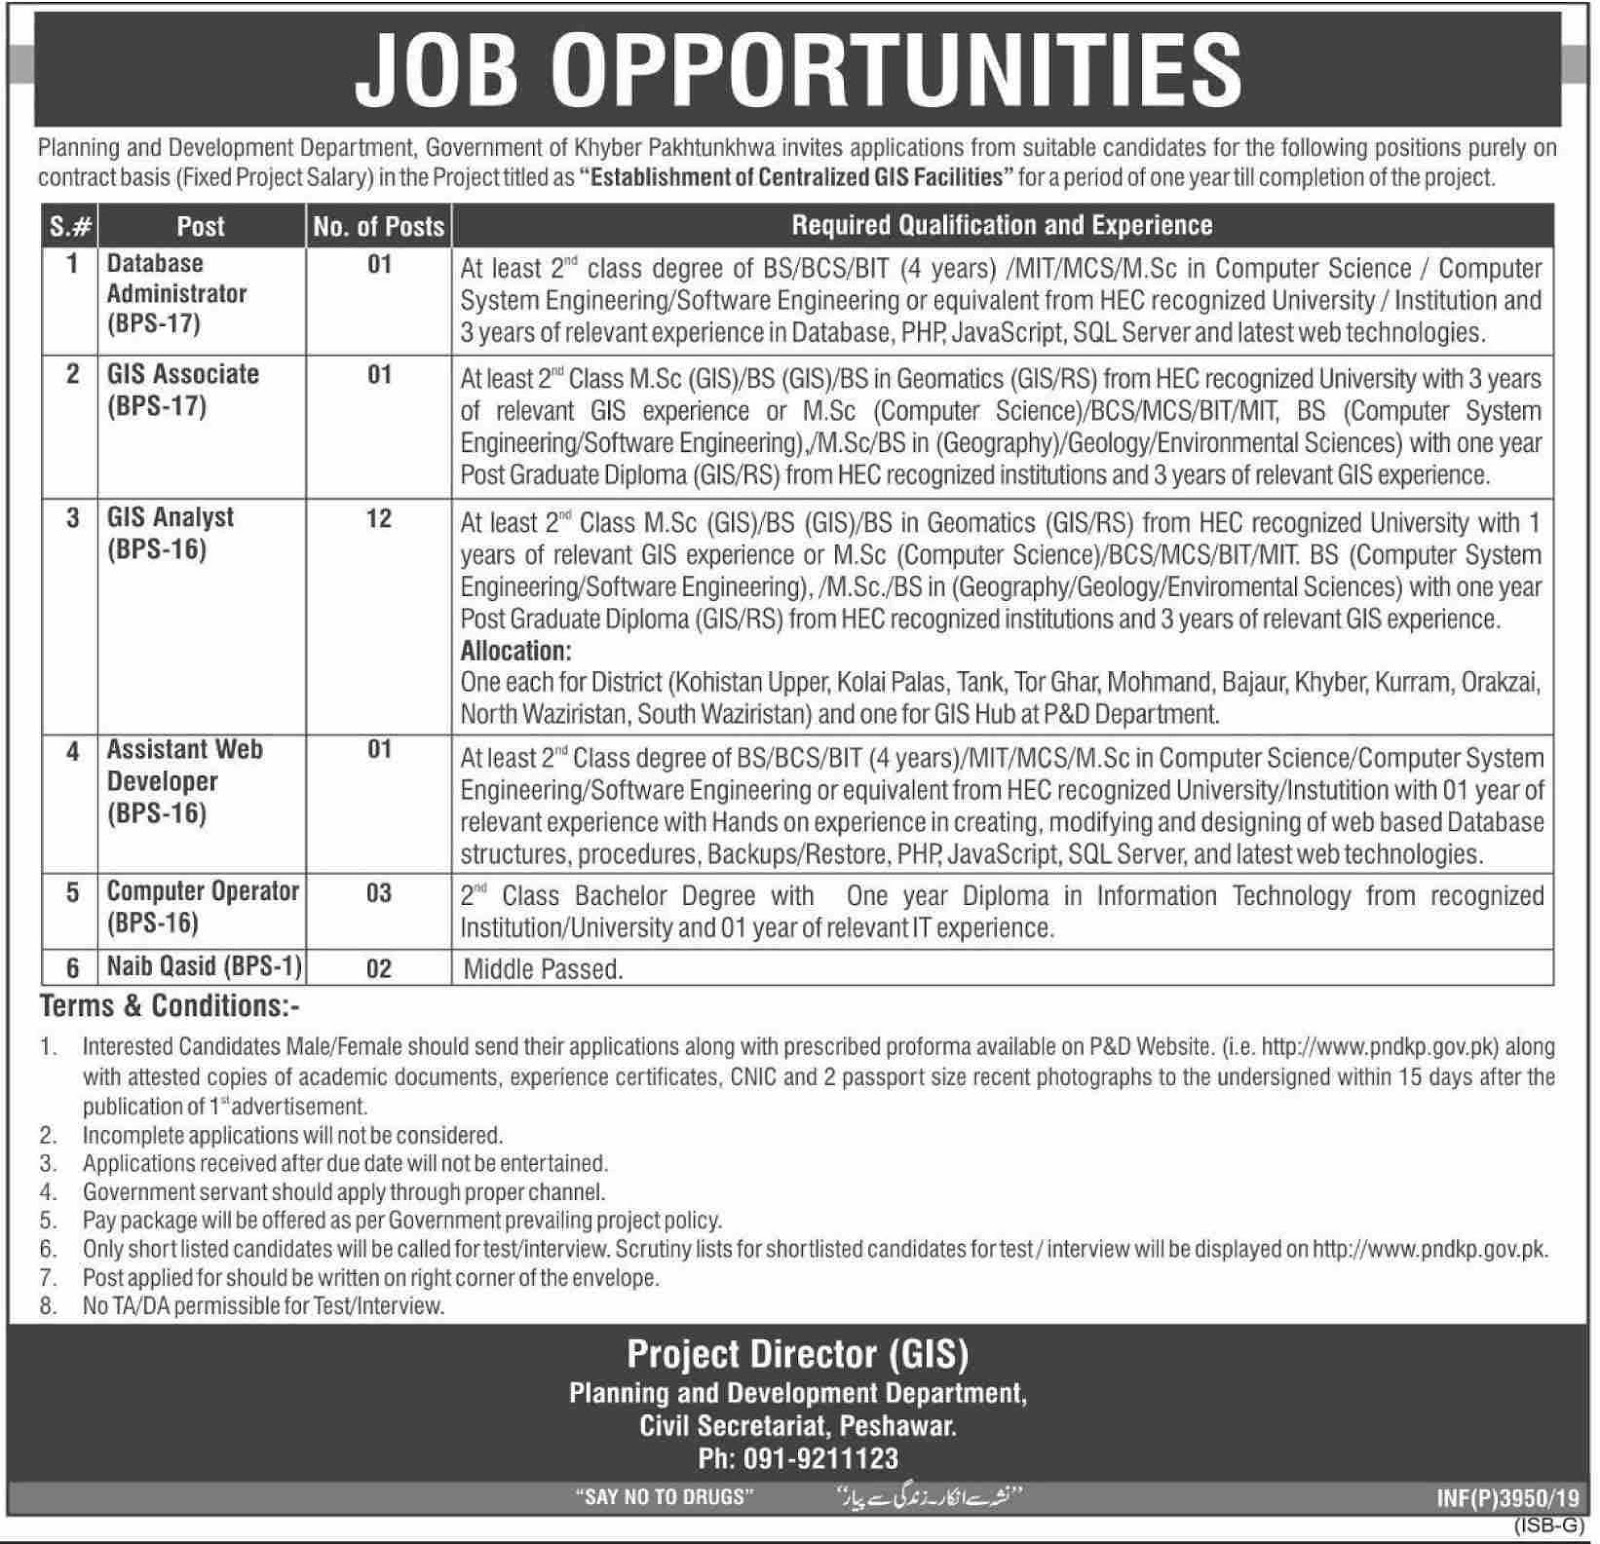 Planning & Development Department in KPK 20 Sept 2019 Jobs